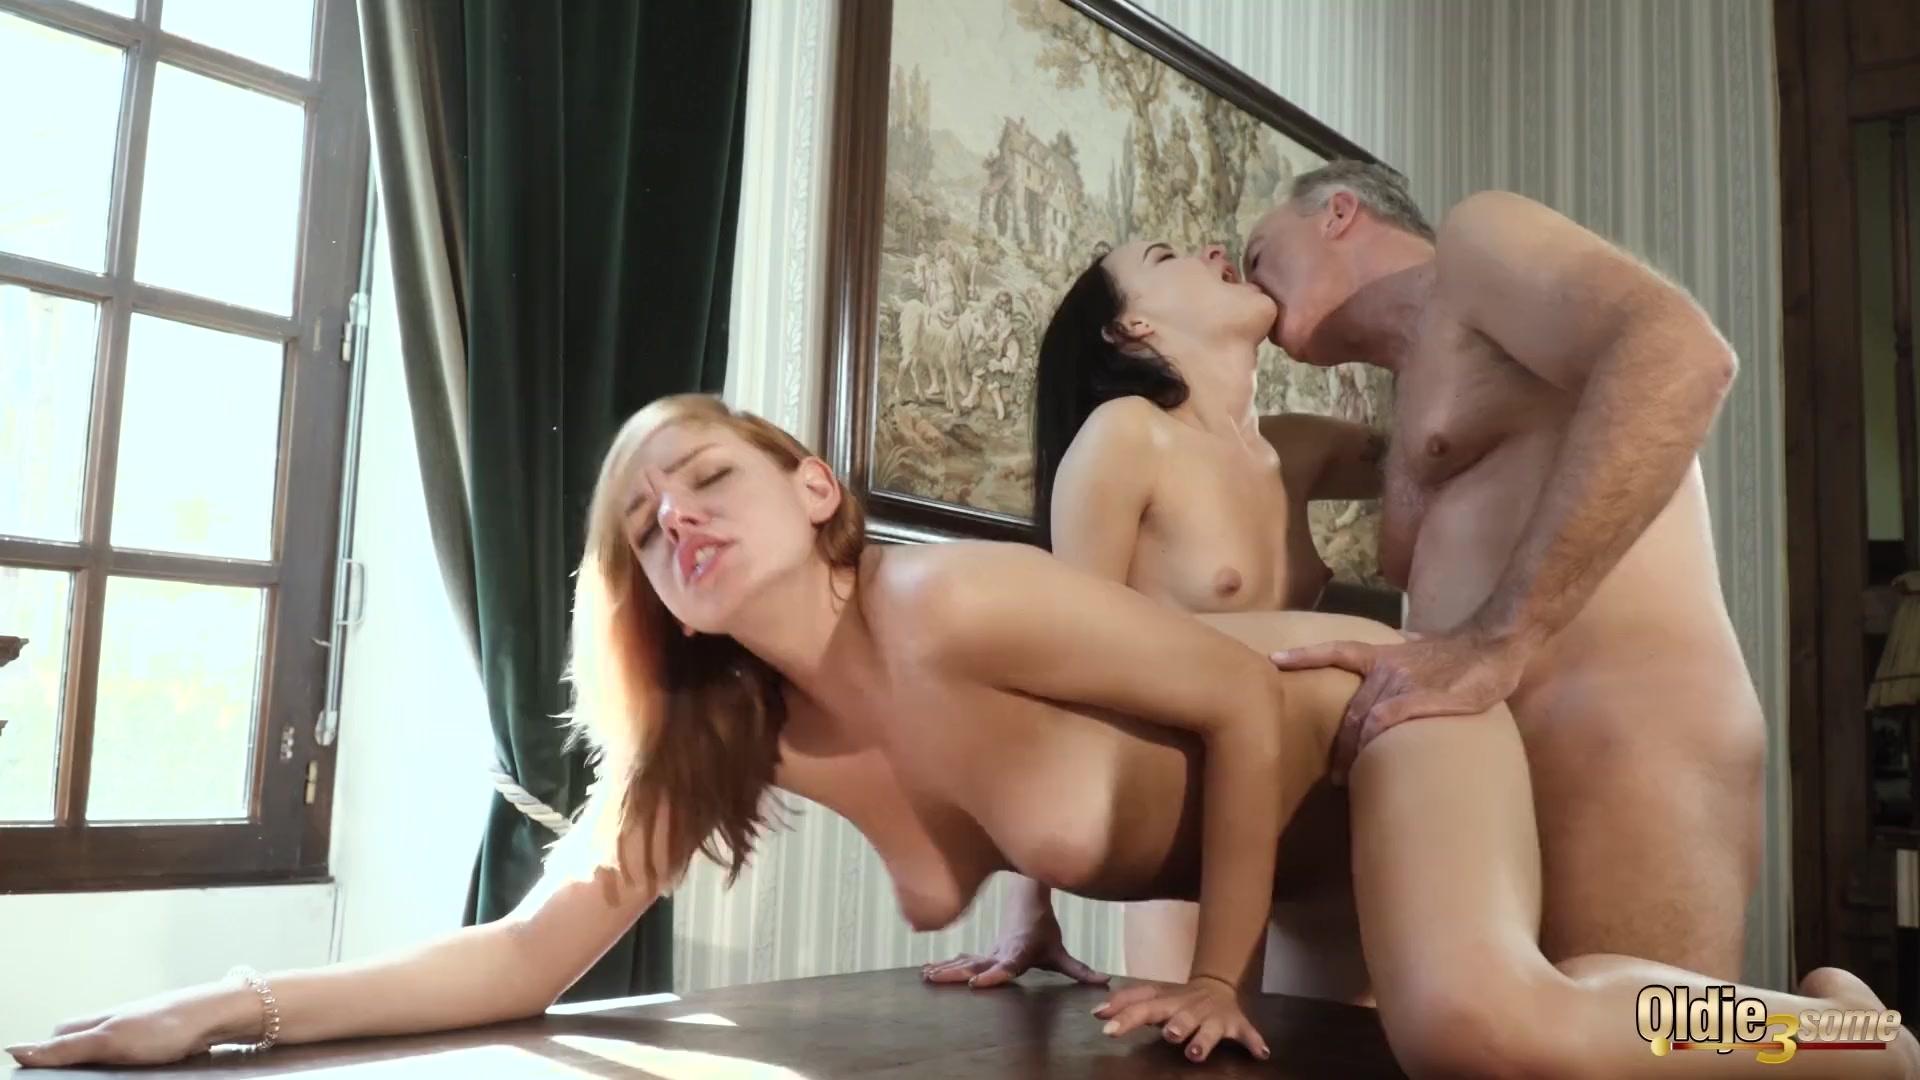 Public orgy porn